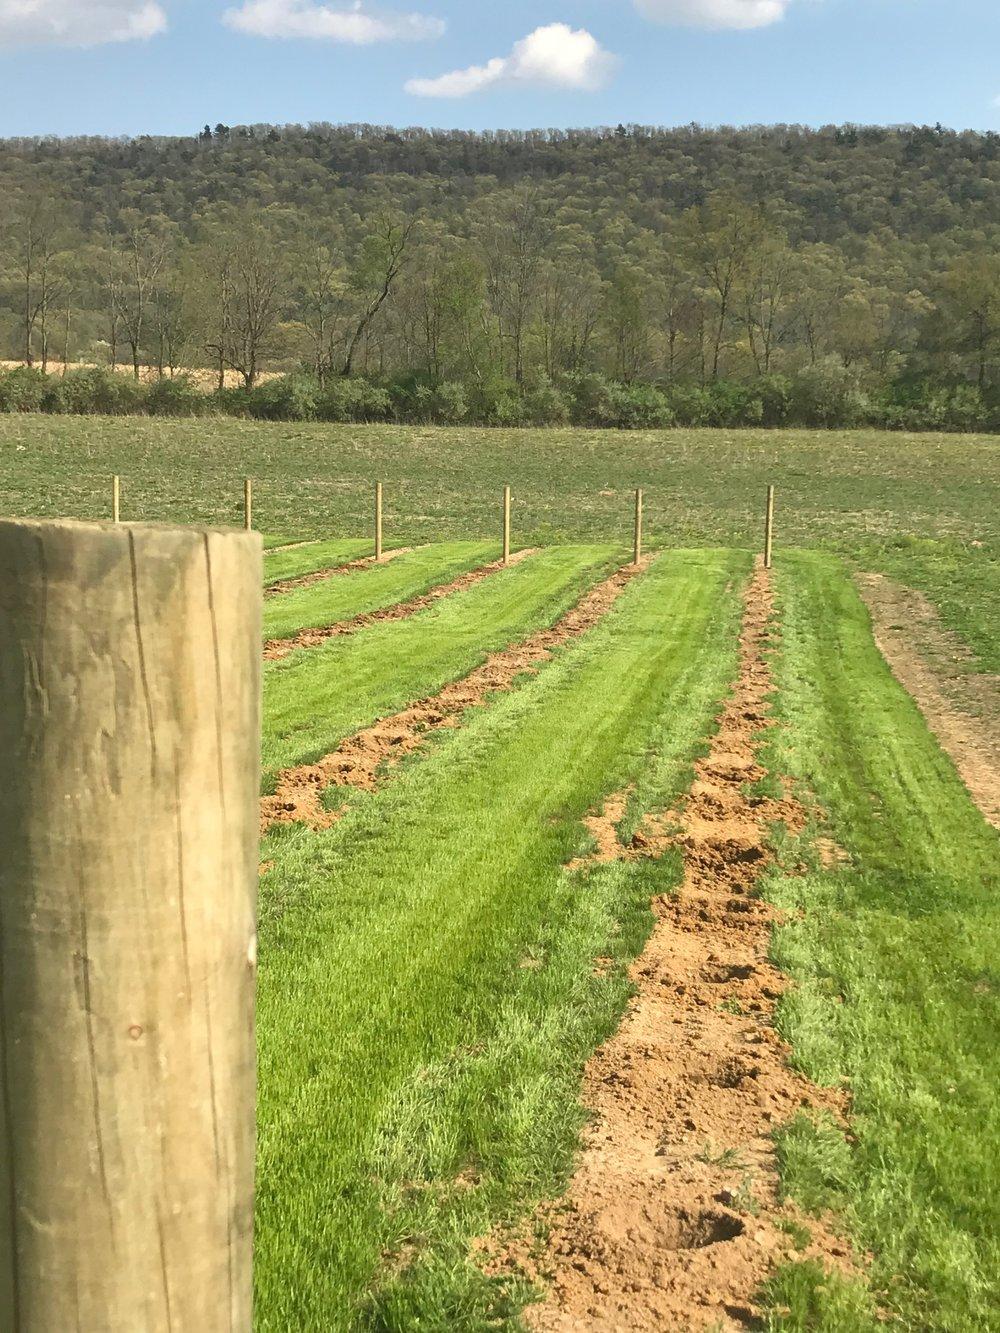 More vineyard posts.